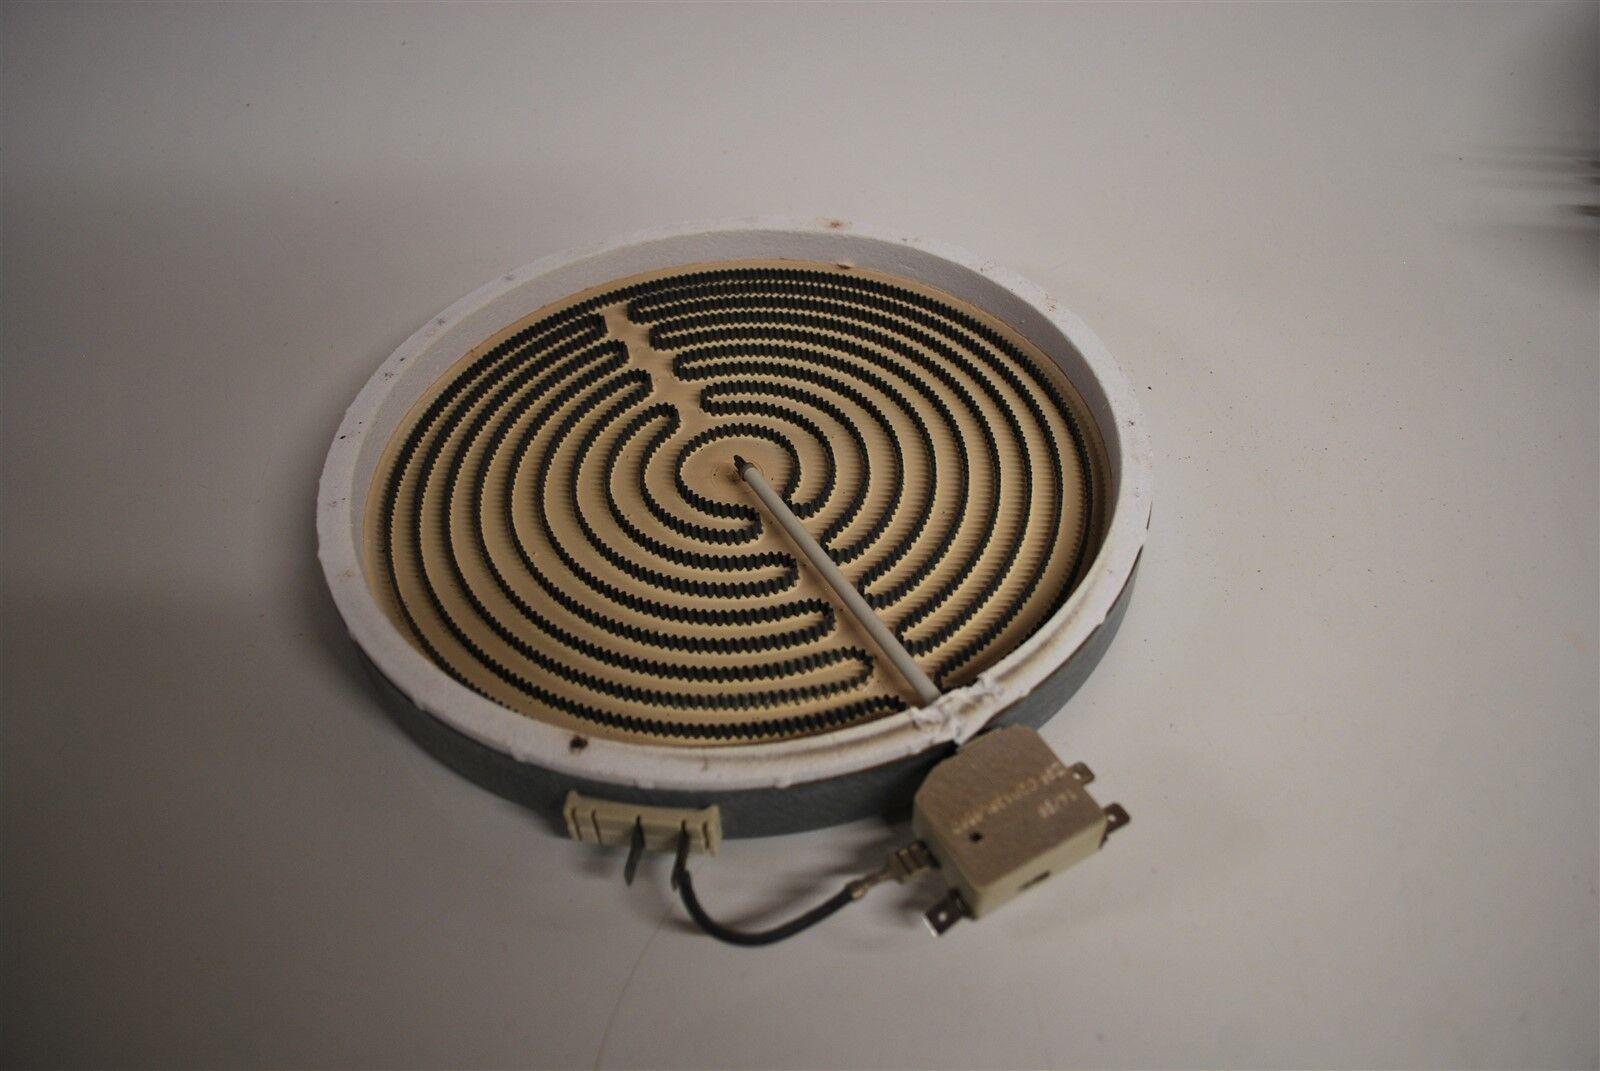 WHIRLPOOL MAYTAG KITCHENAID Range Oven Surface Element 8273994